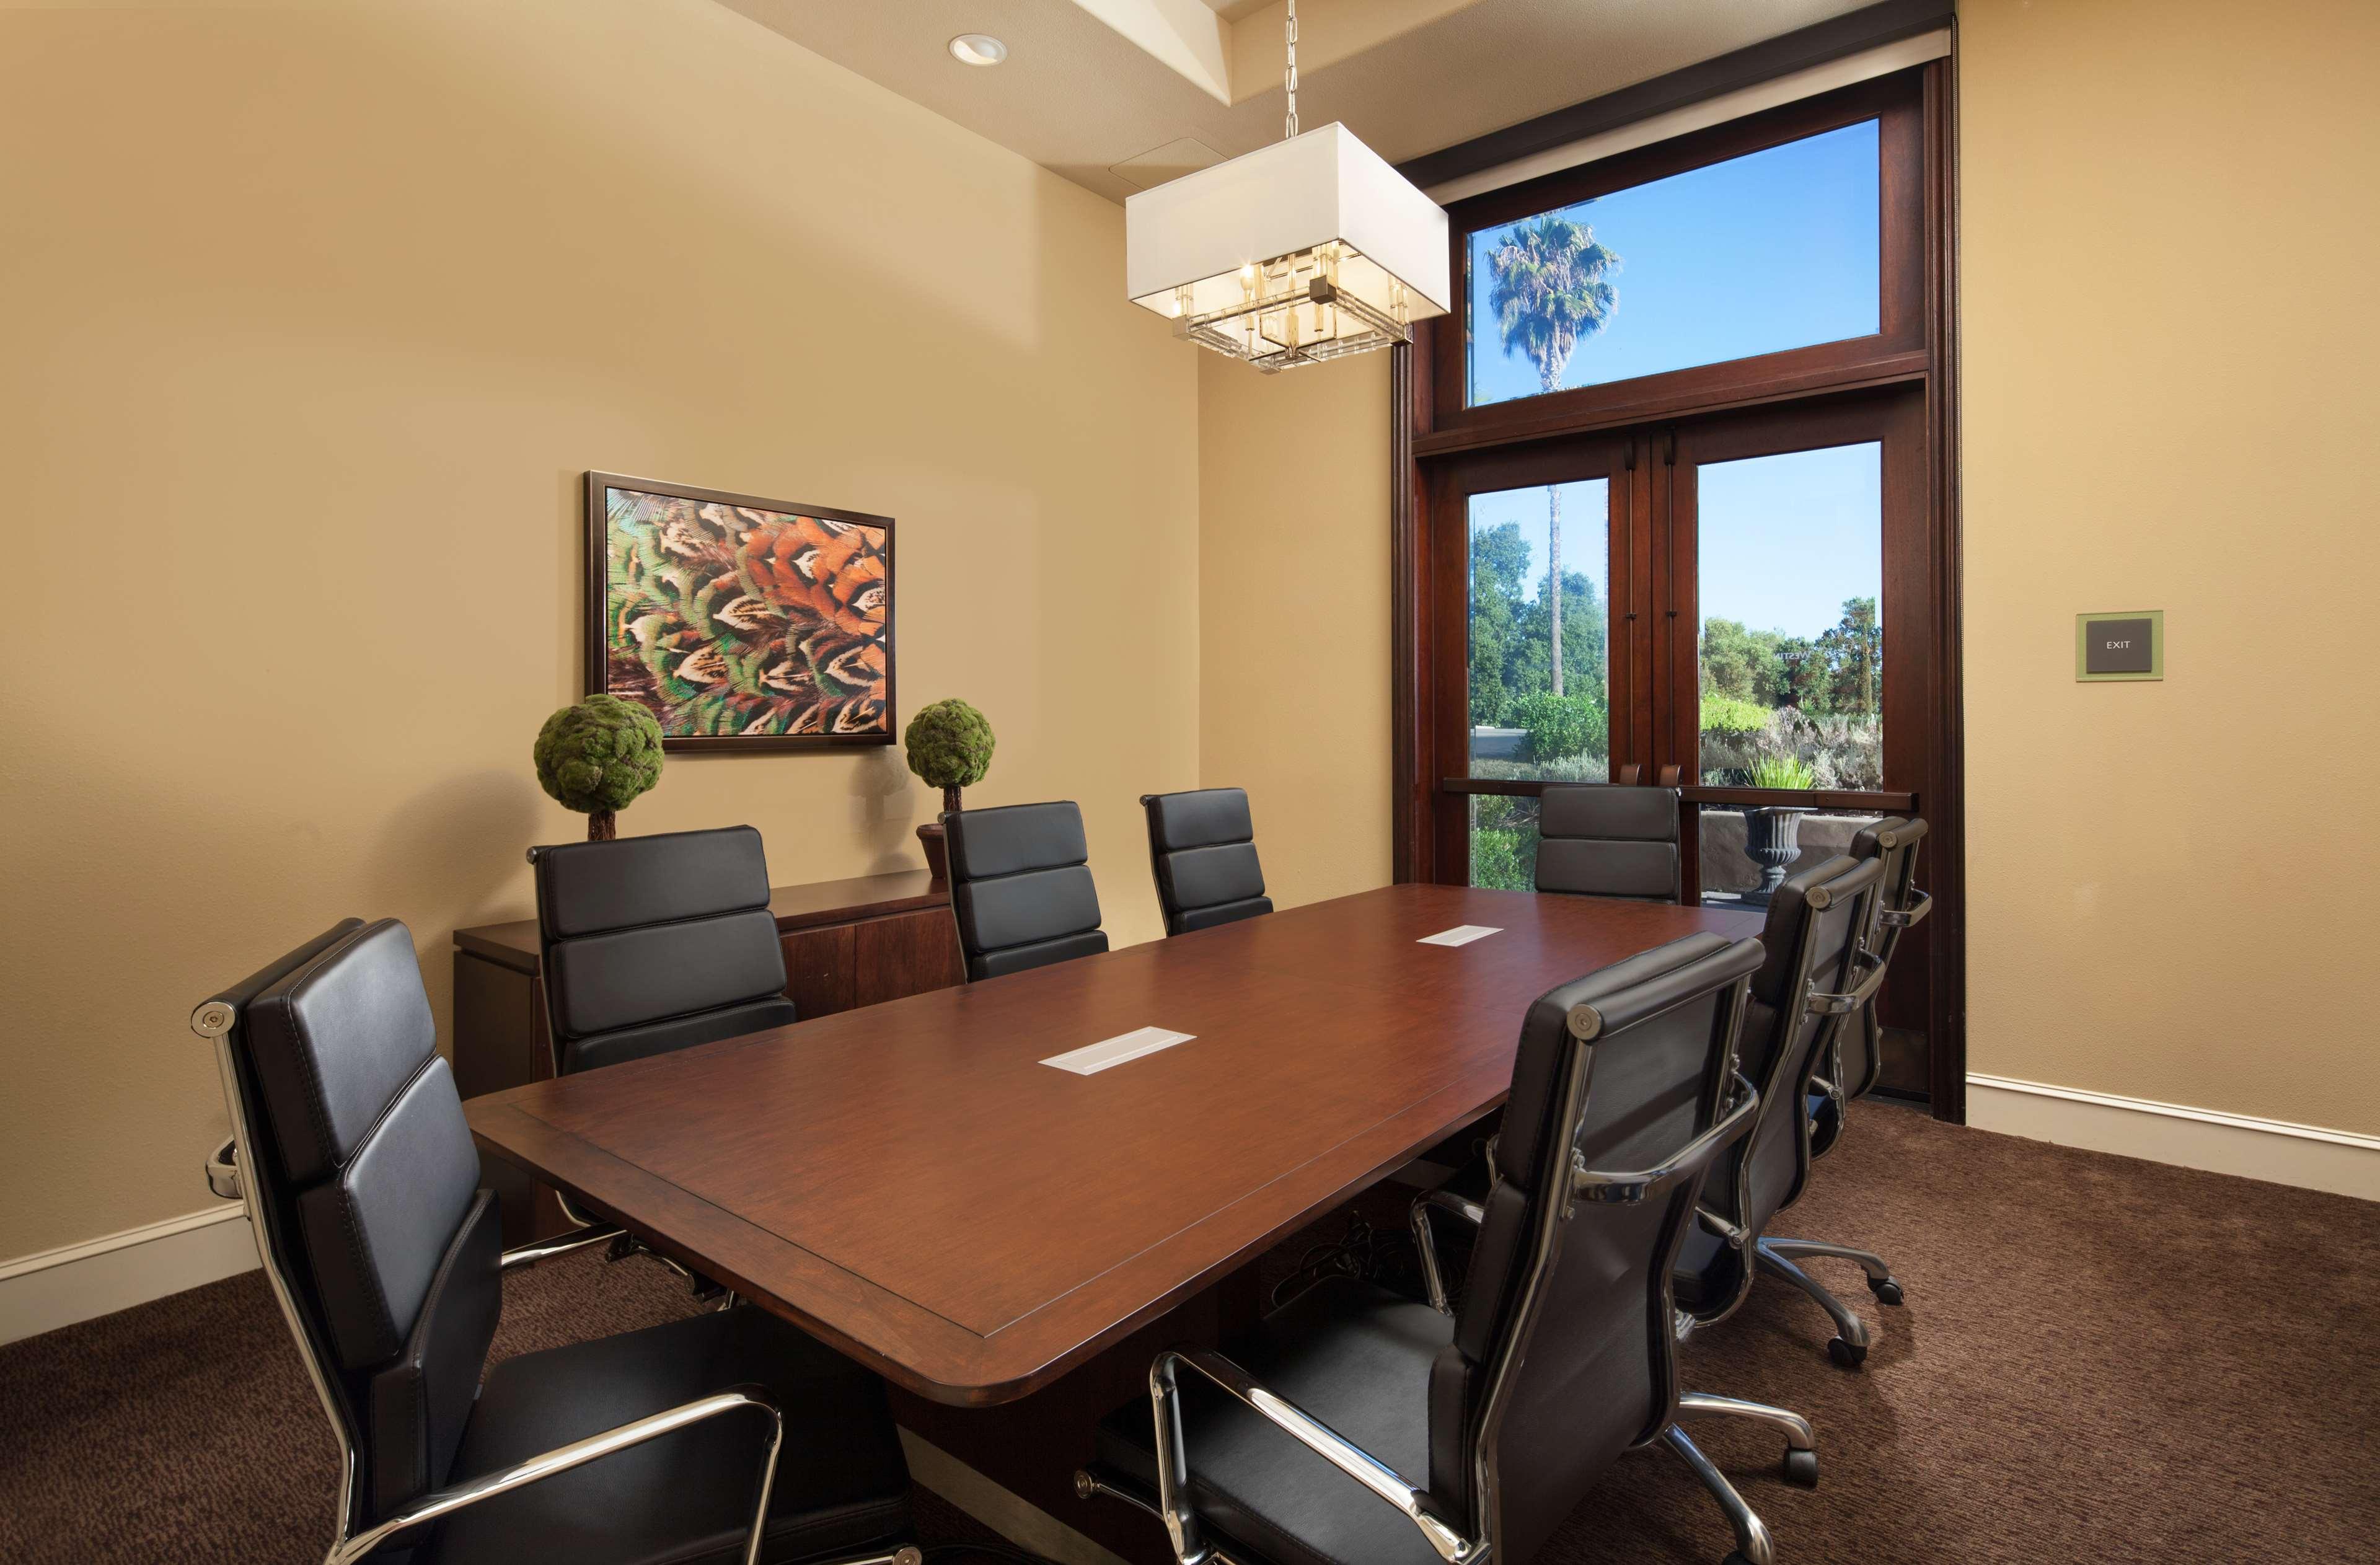 Siena Boardroom